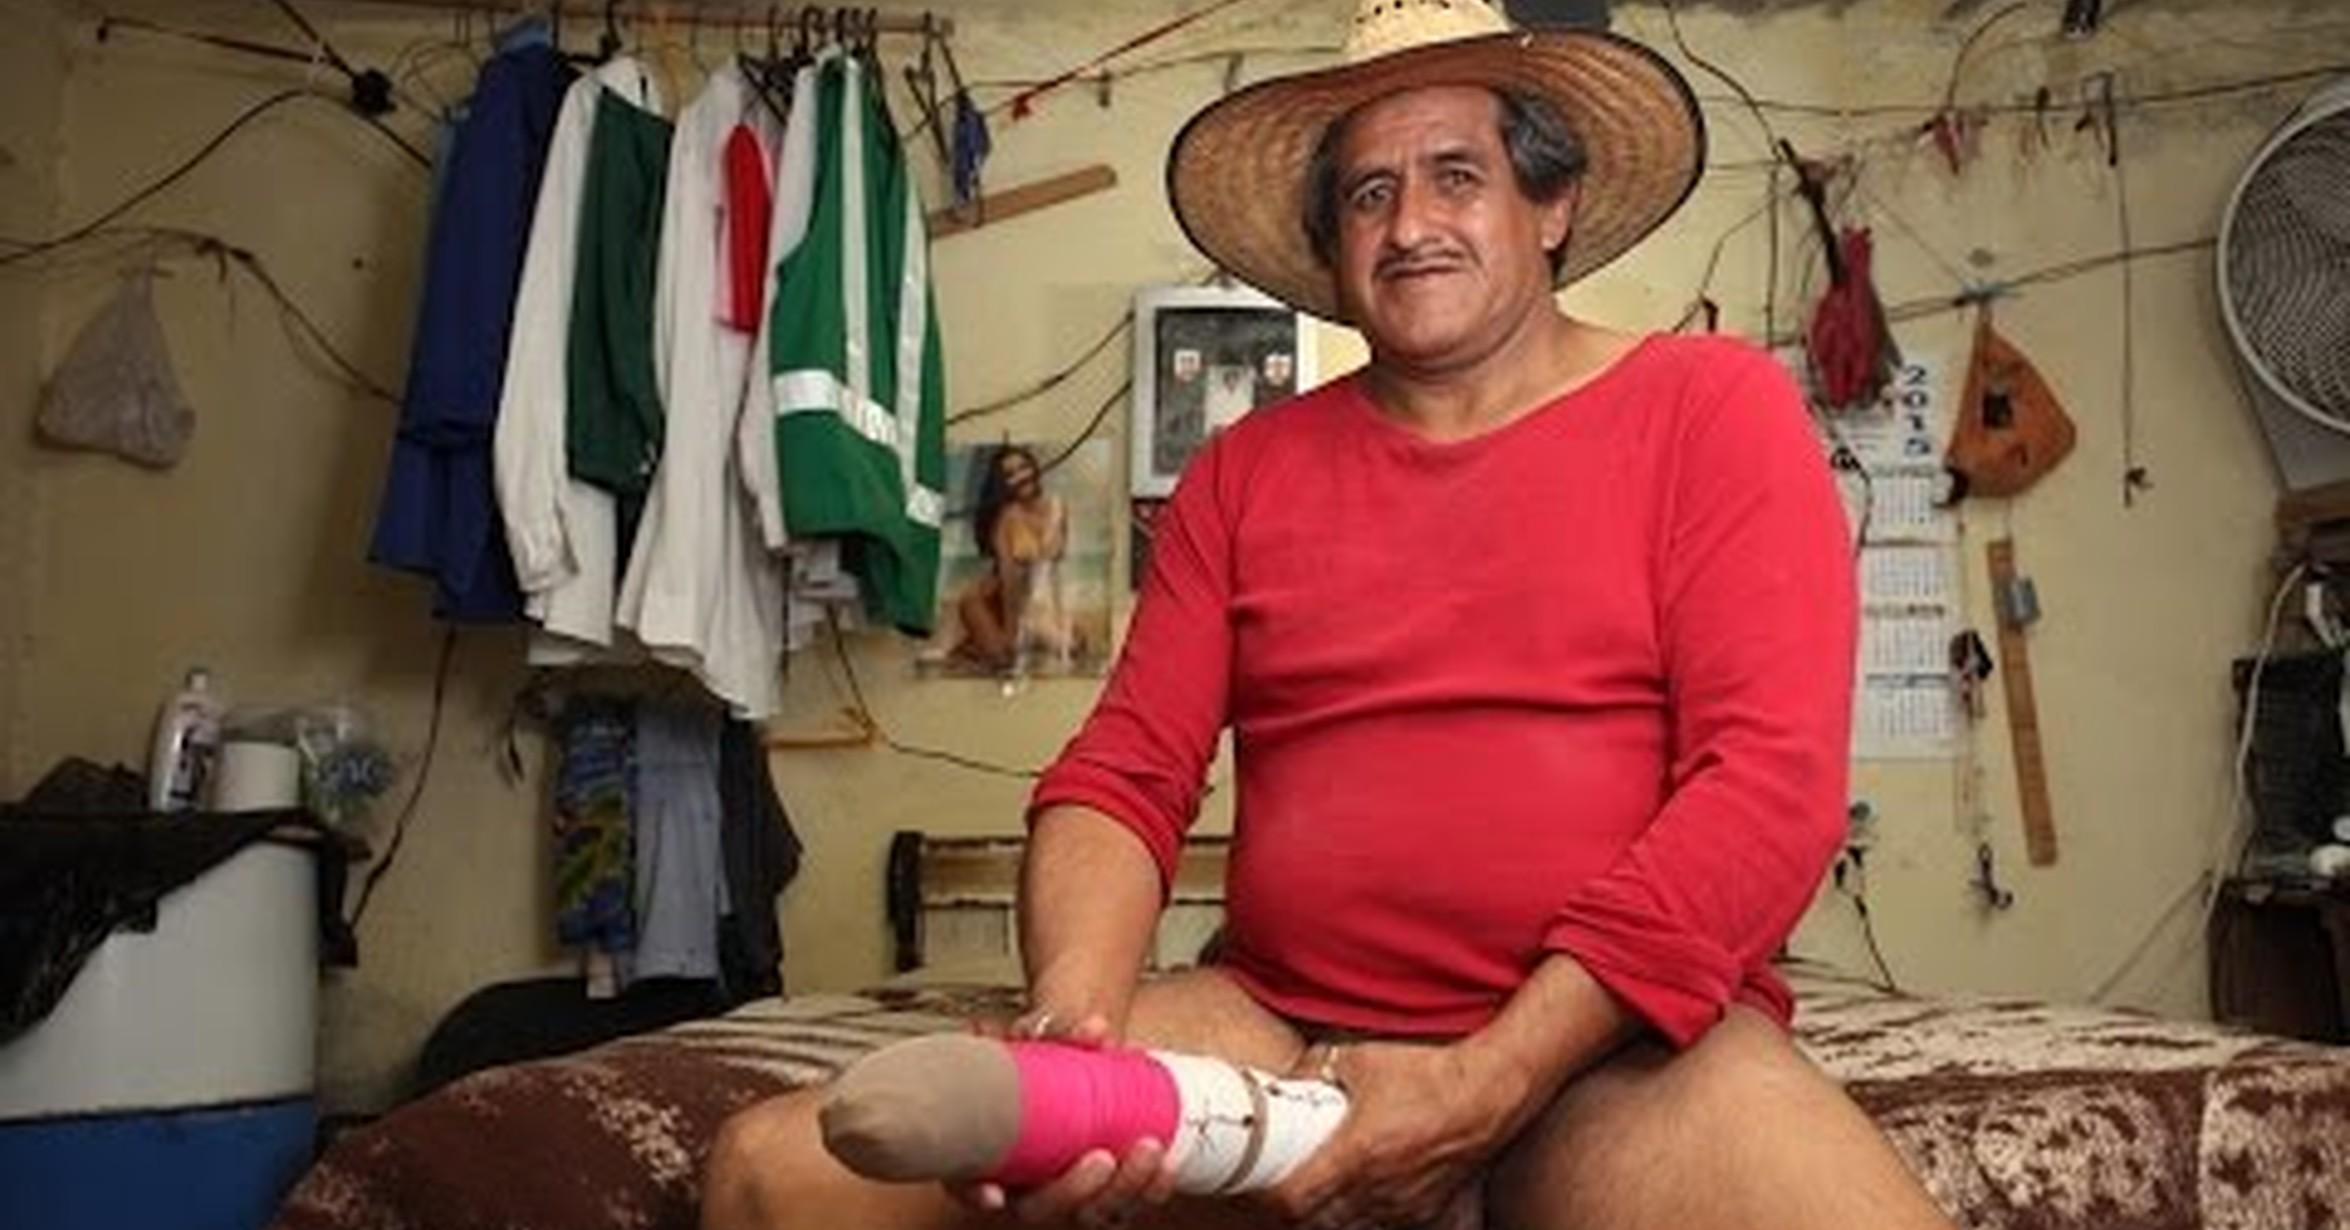 El hombre mas solo del mundo nirvana sexo no cobro Huelva-33571